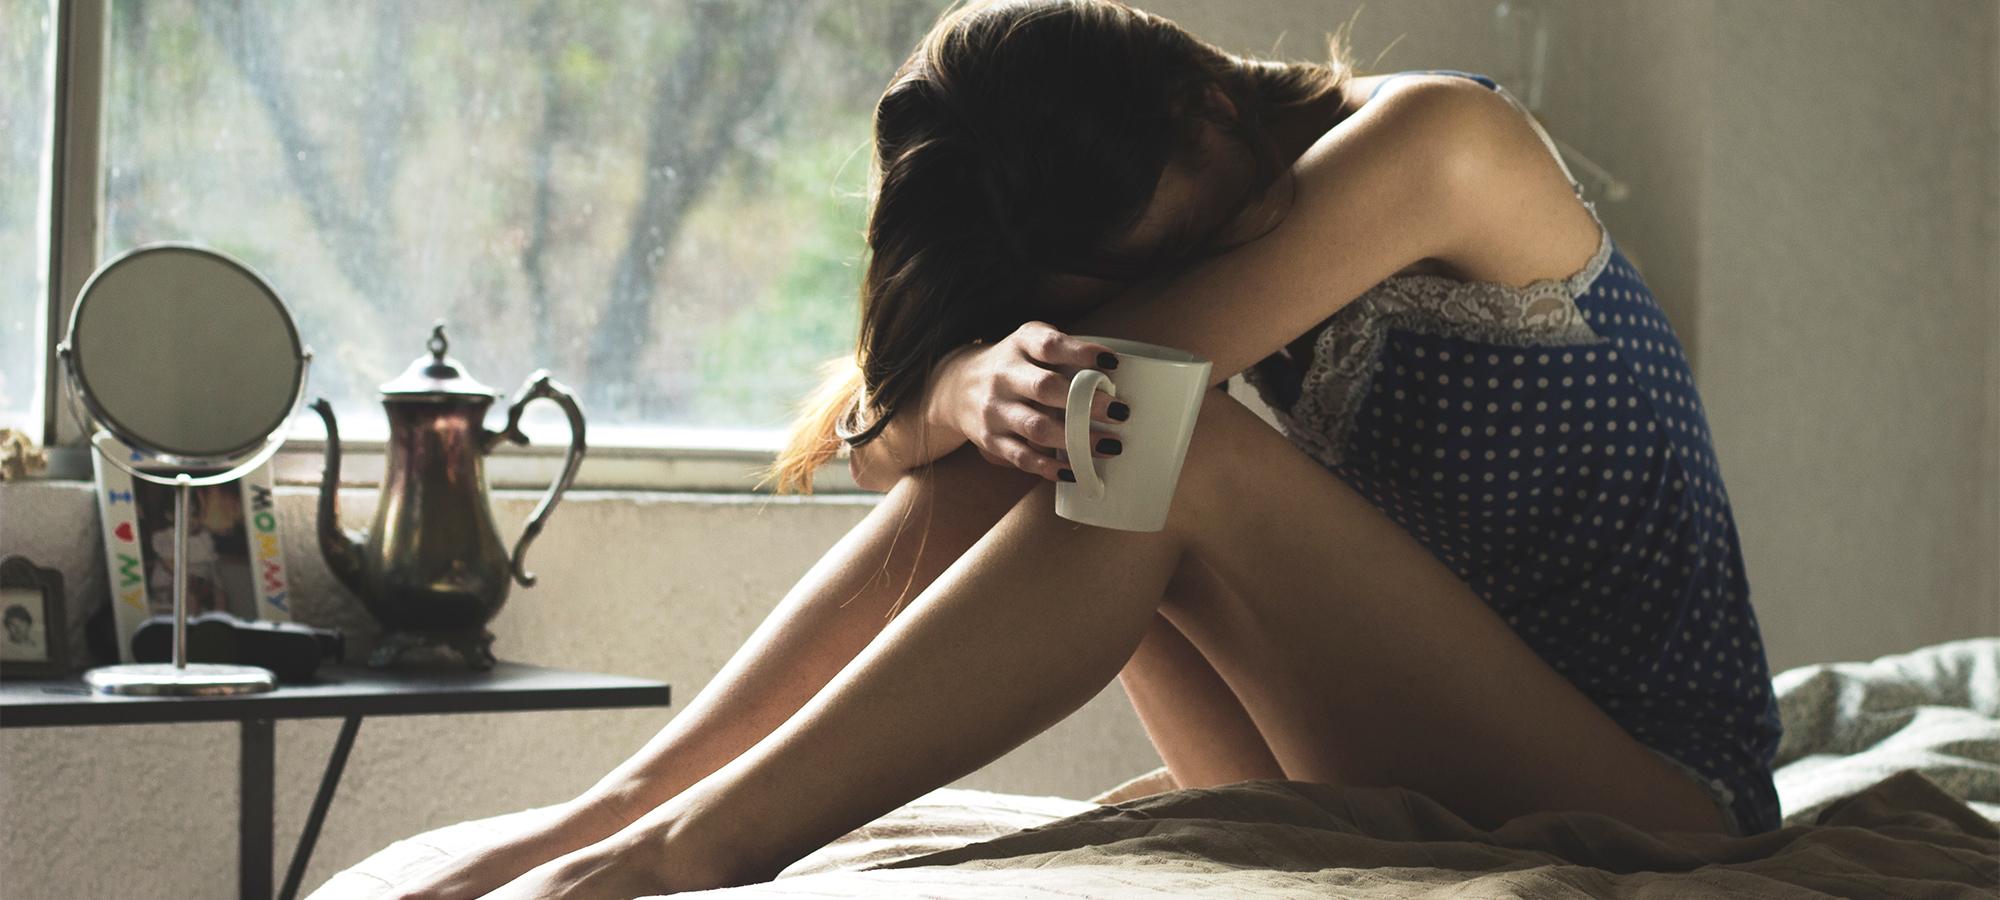 glutenintolerans symptom depression